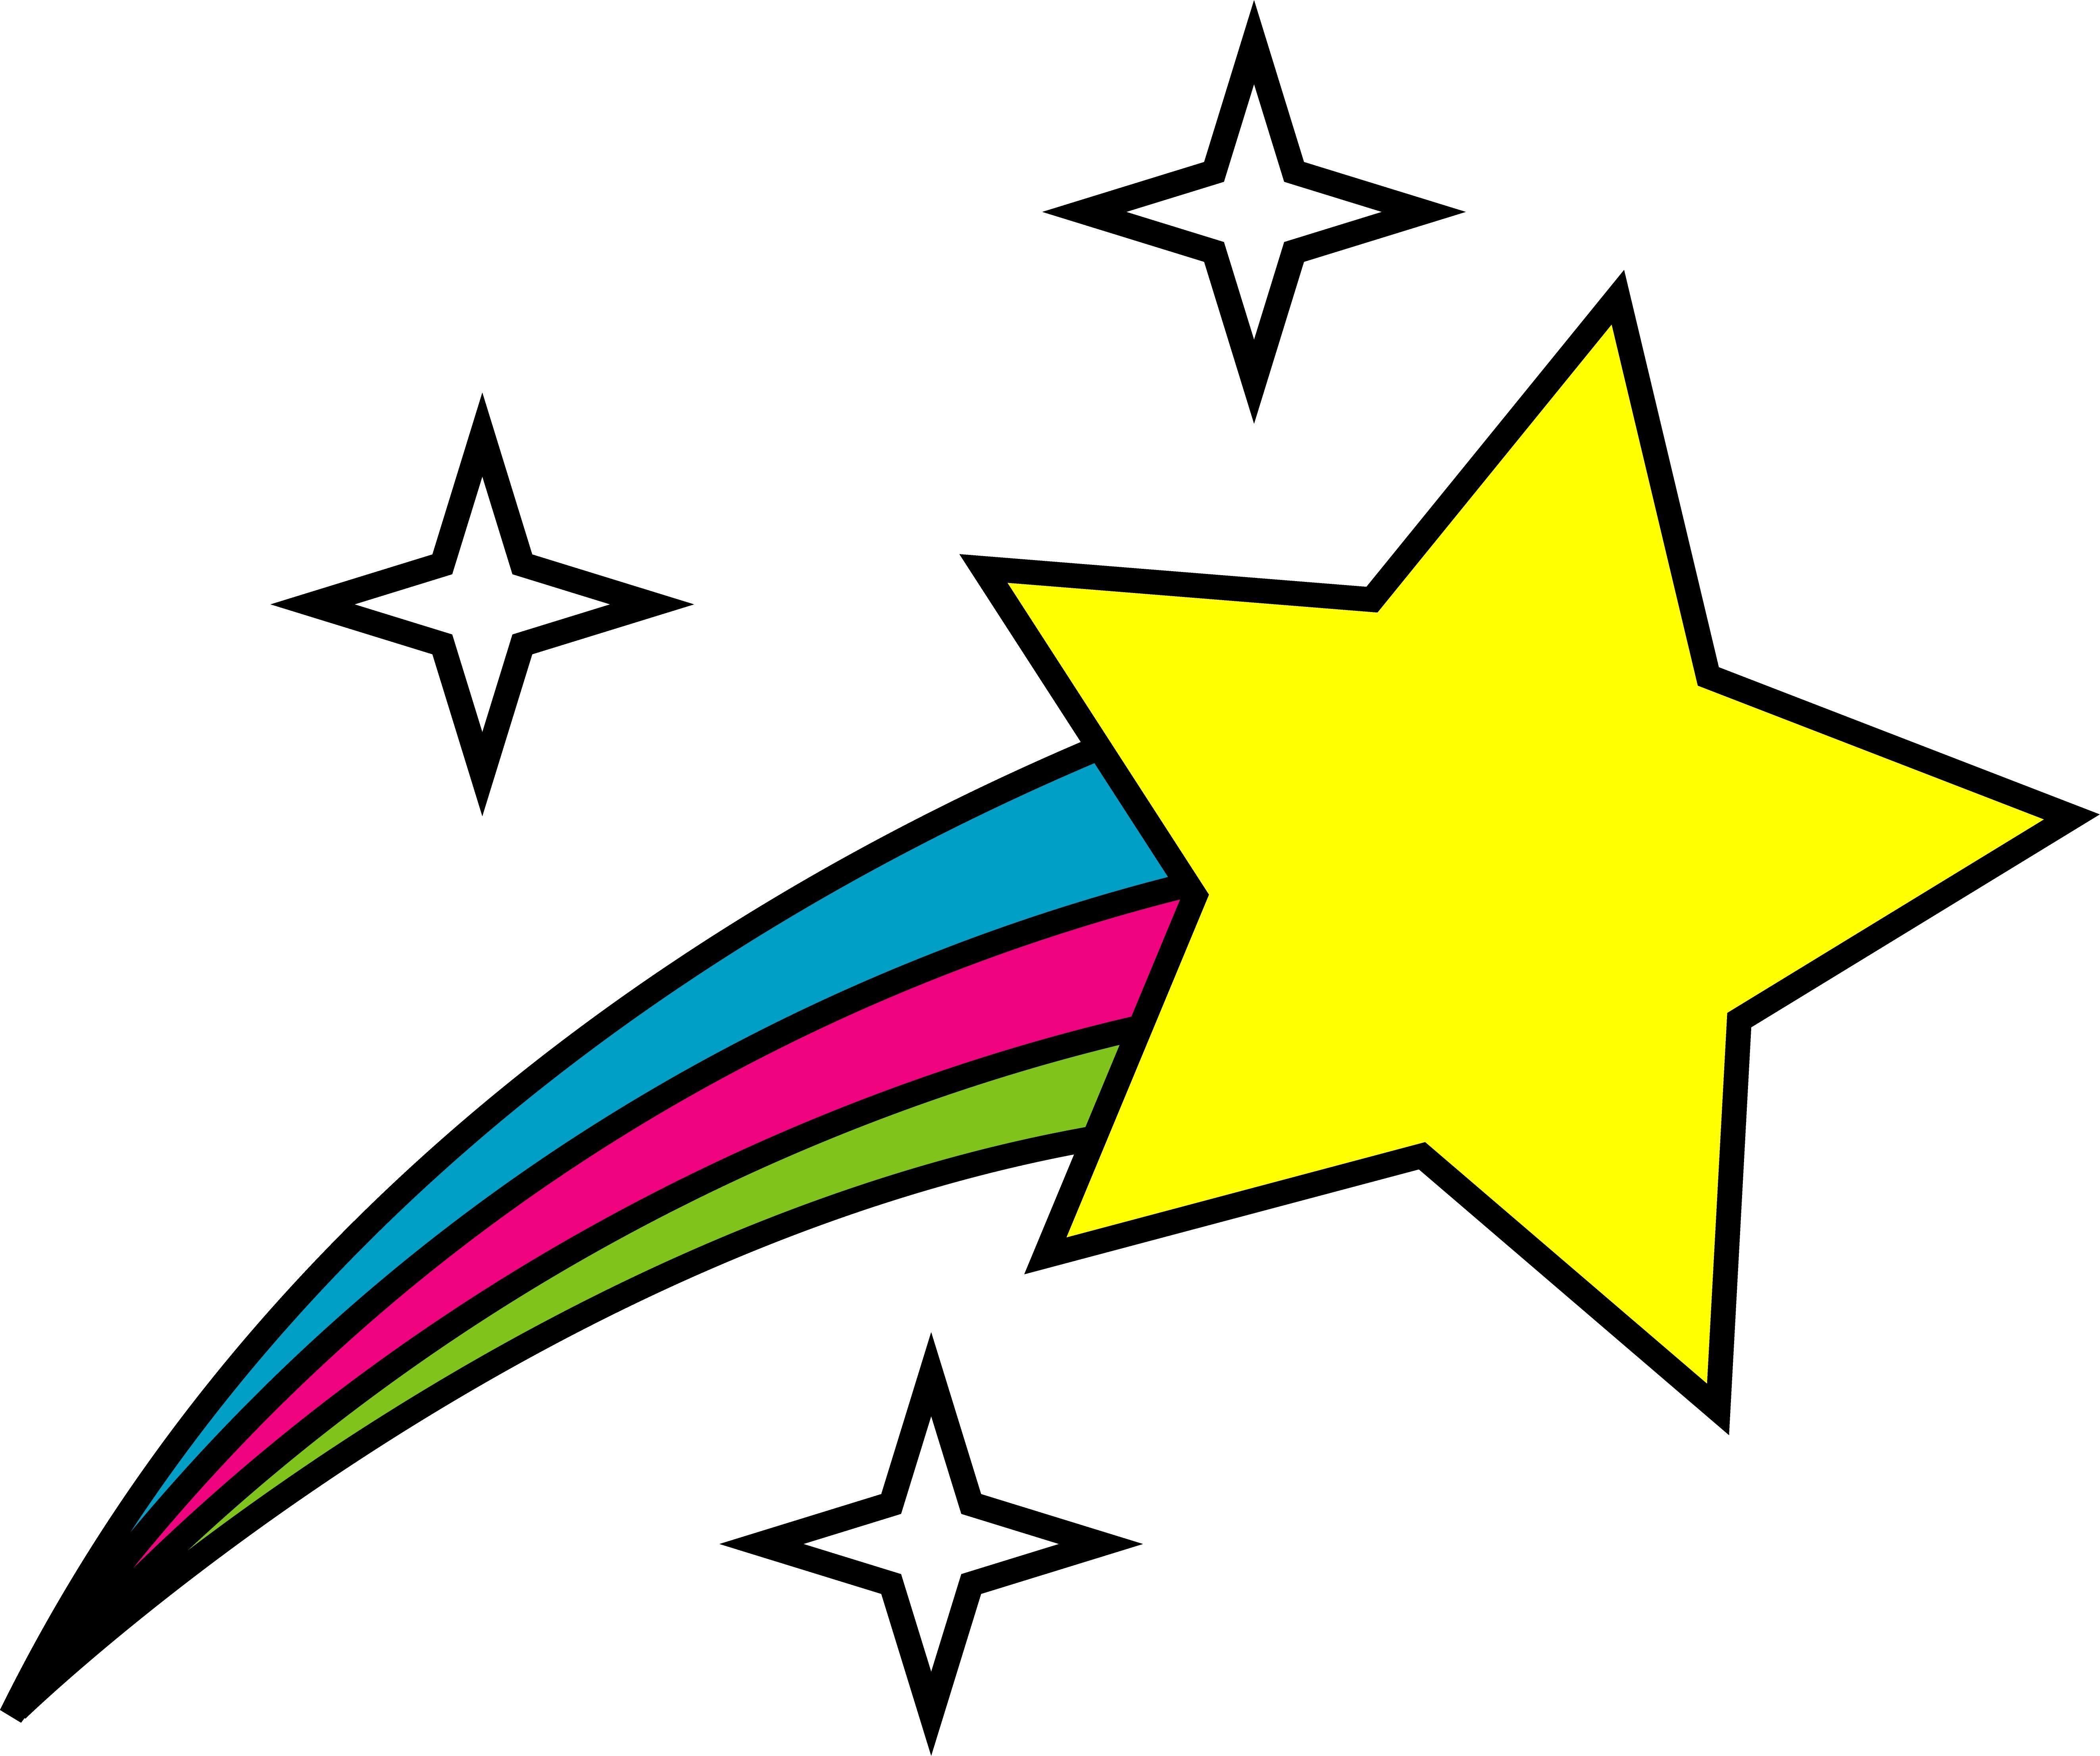 clipart star outer space symbol shooting star dyspraxia foundation rh dyspraxiafoundation org uk clipart star of david clipart starfish svg